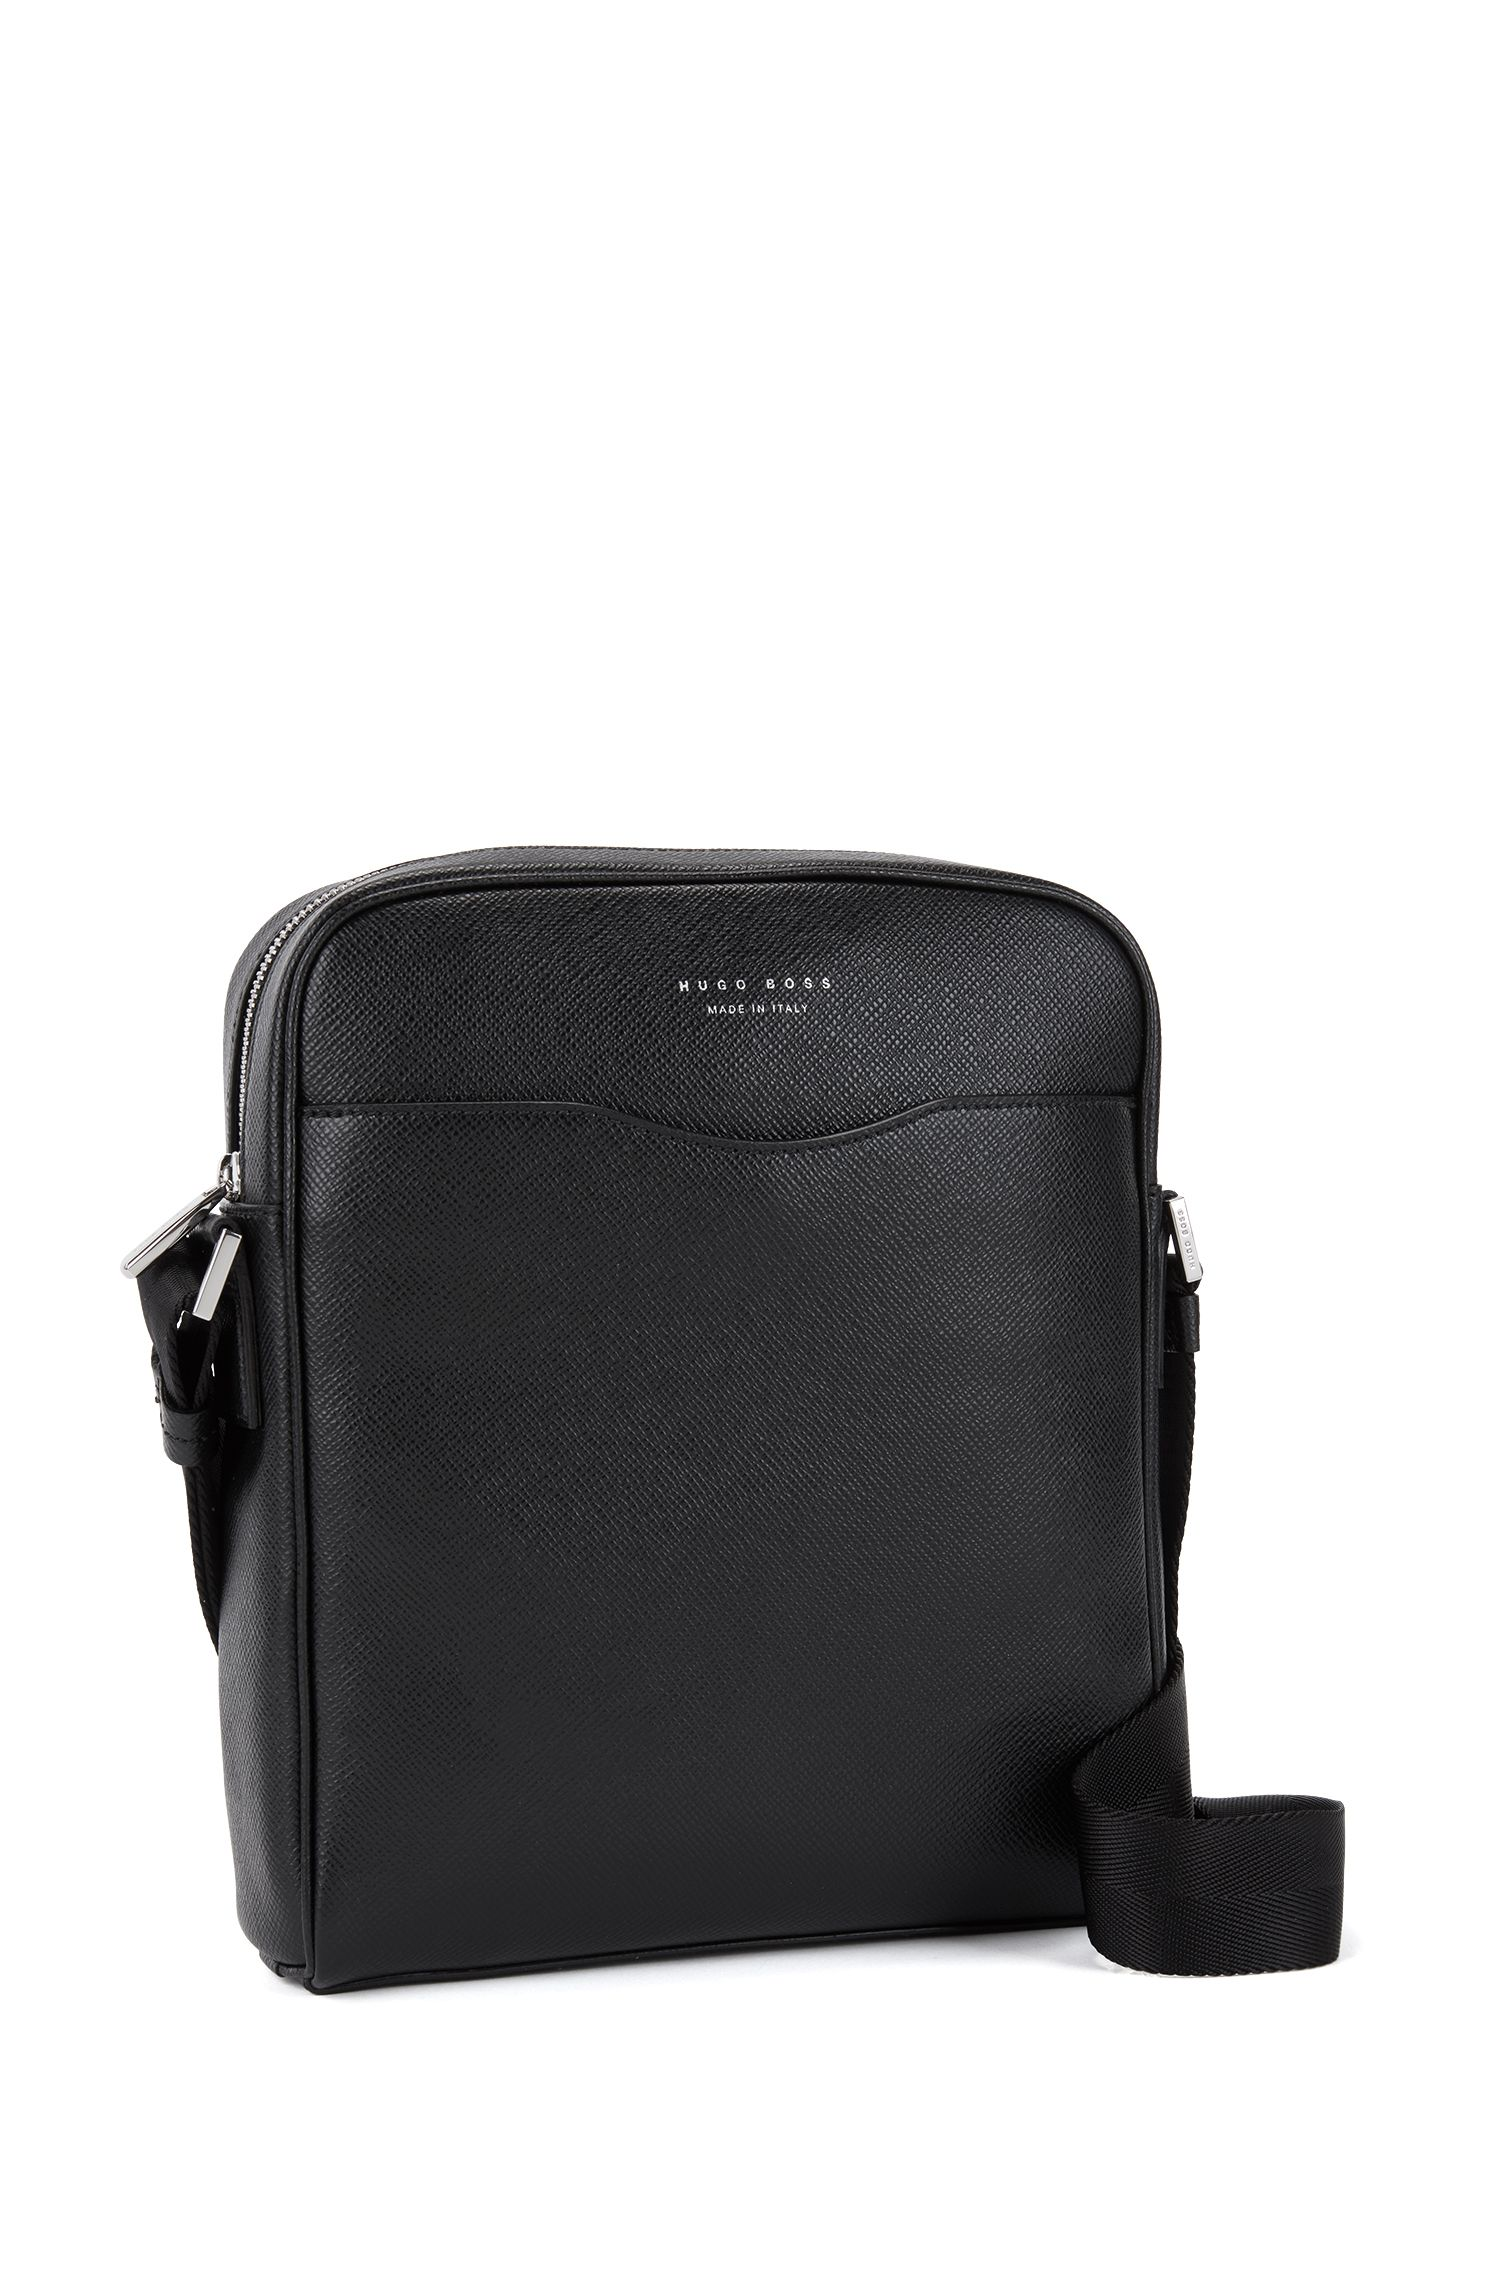 Calfskin Reporter Bag | Signature NS Zip, Black